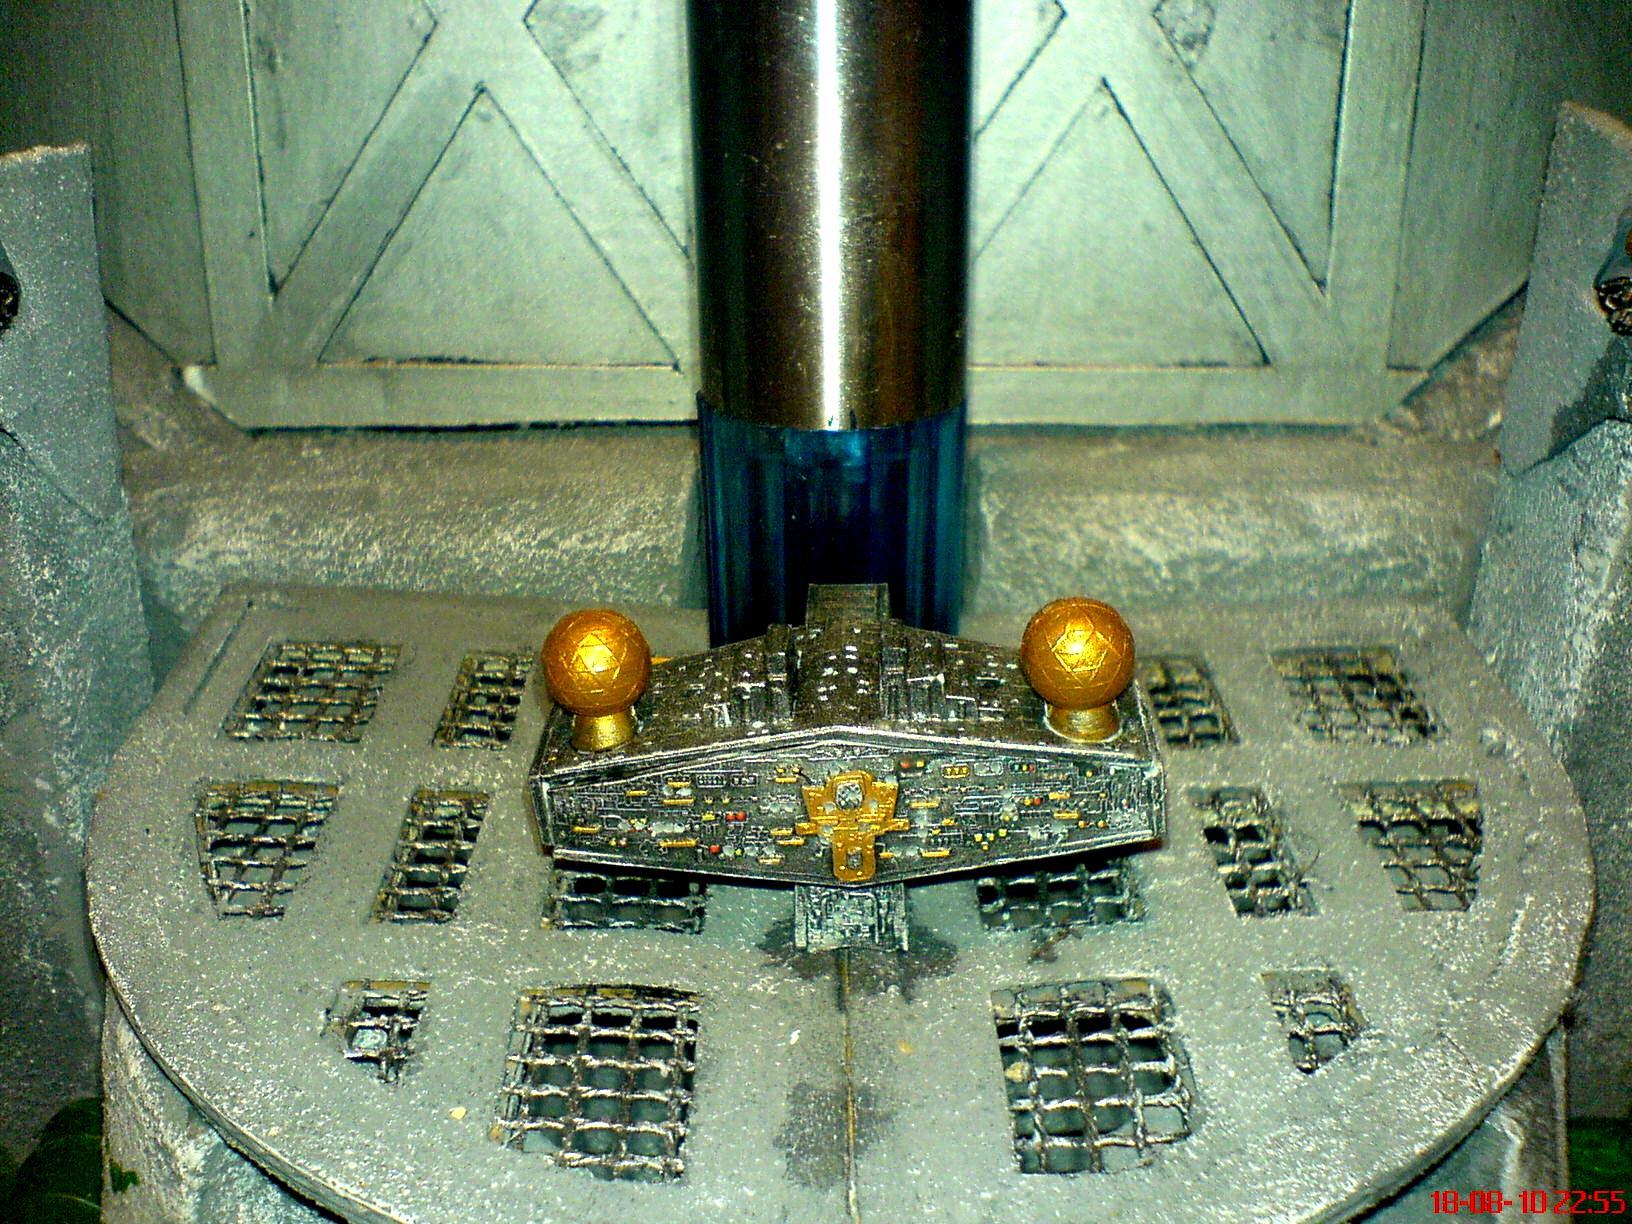 Reactor Control Panel